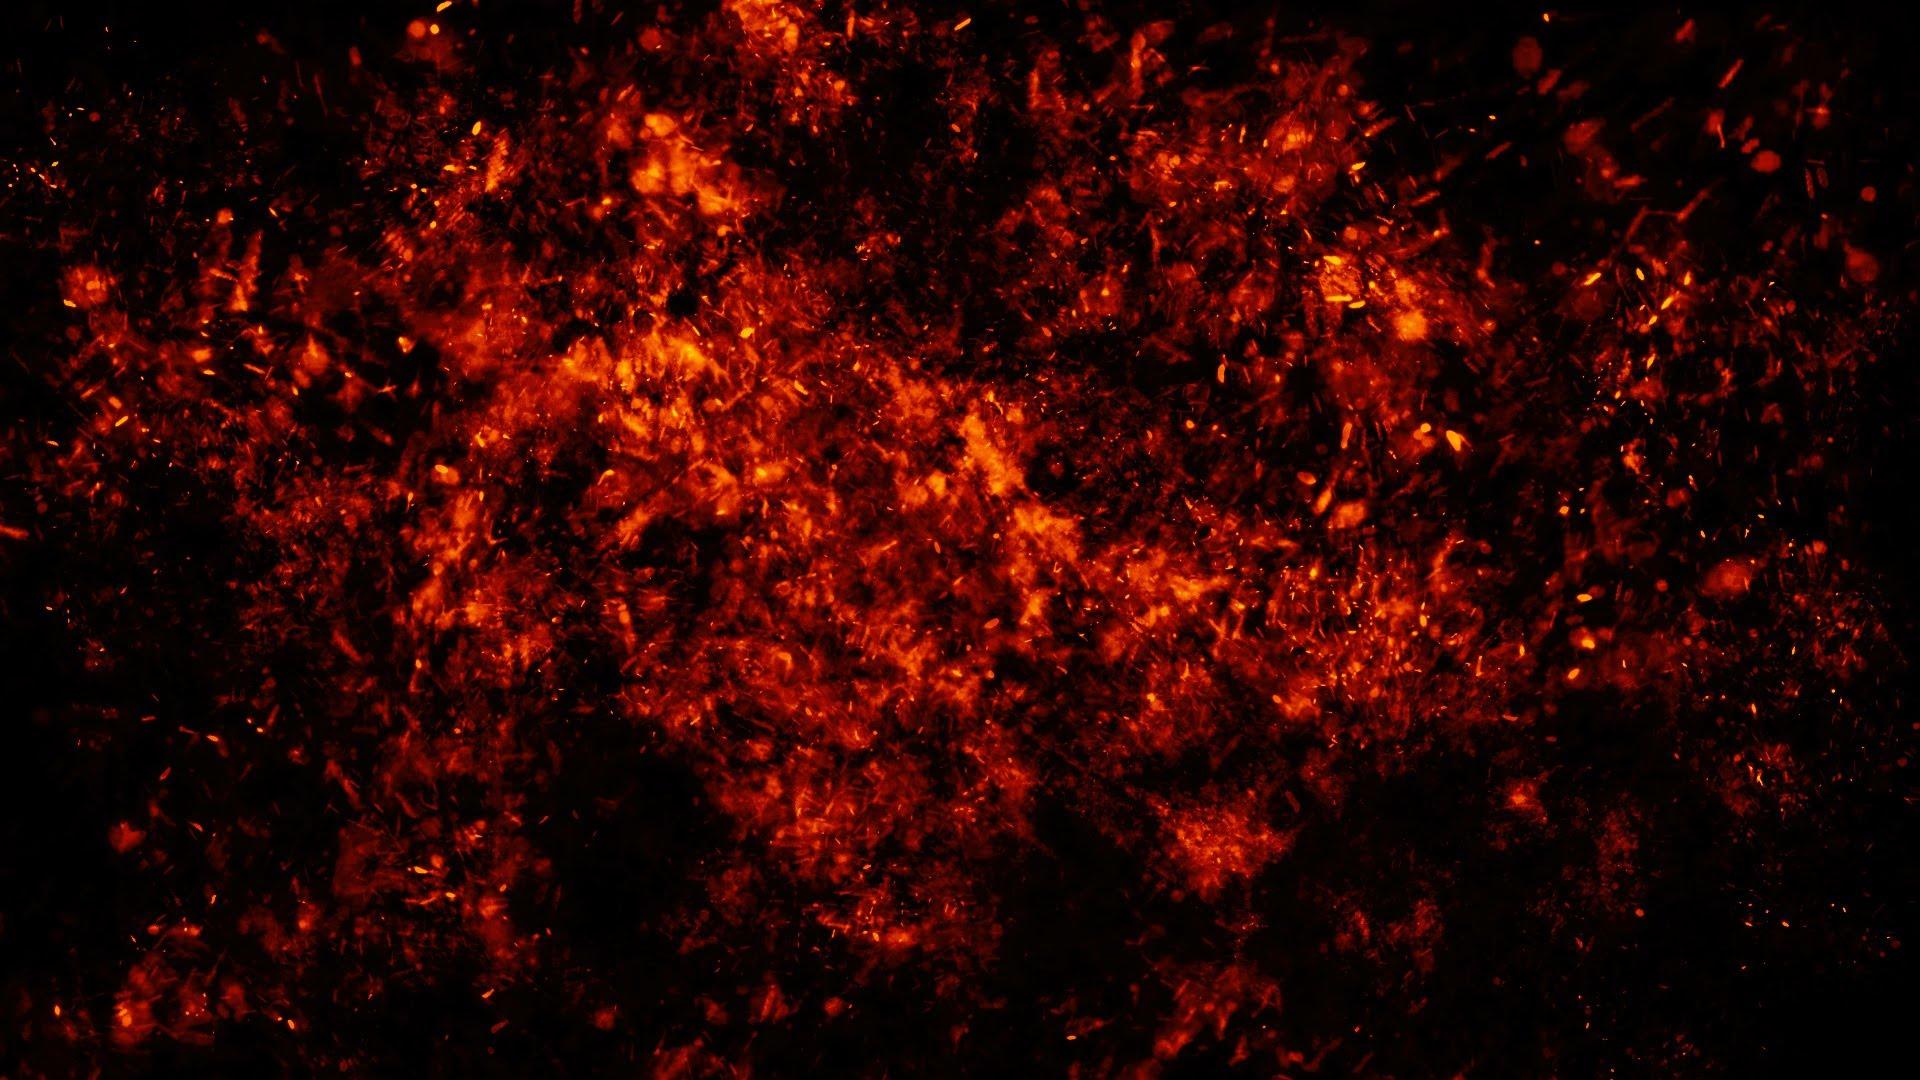 13 Fire Sparks PSD Images - Photoshop Fire Flames, Photoshop